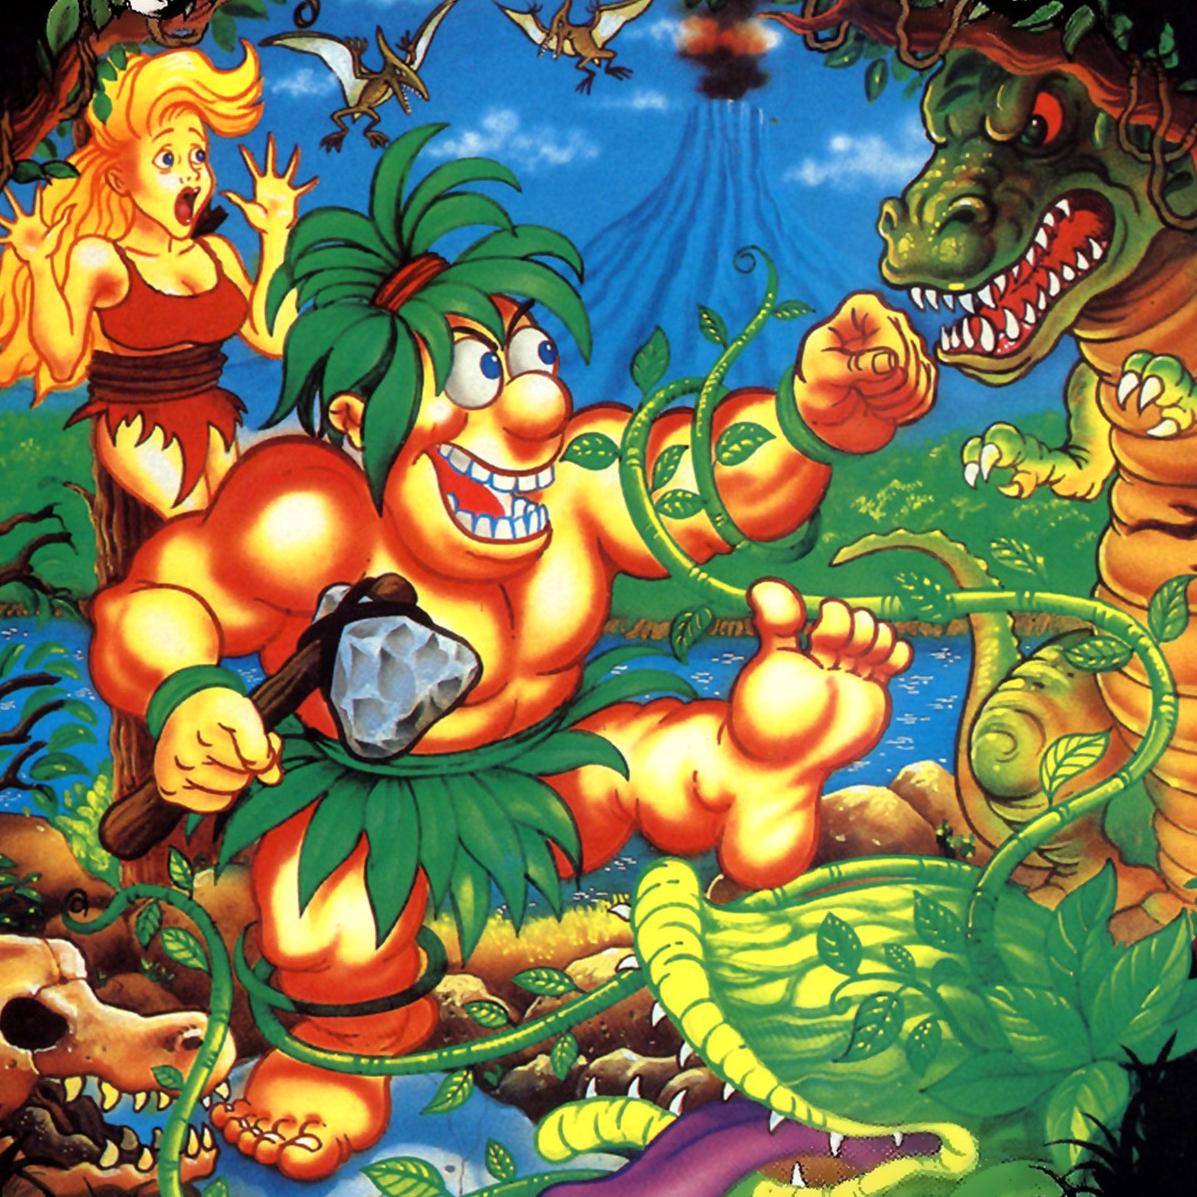 Play Joe And Mac: Caveman Ninja on SEGA - Emulator Online